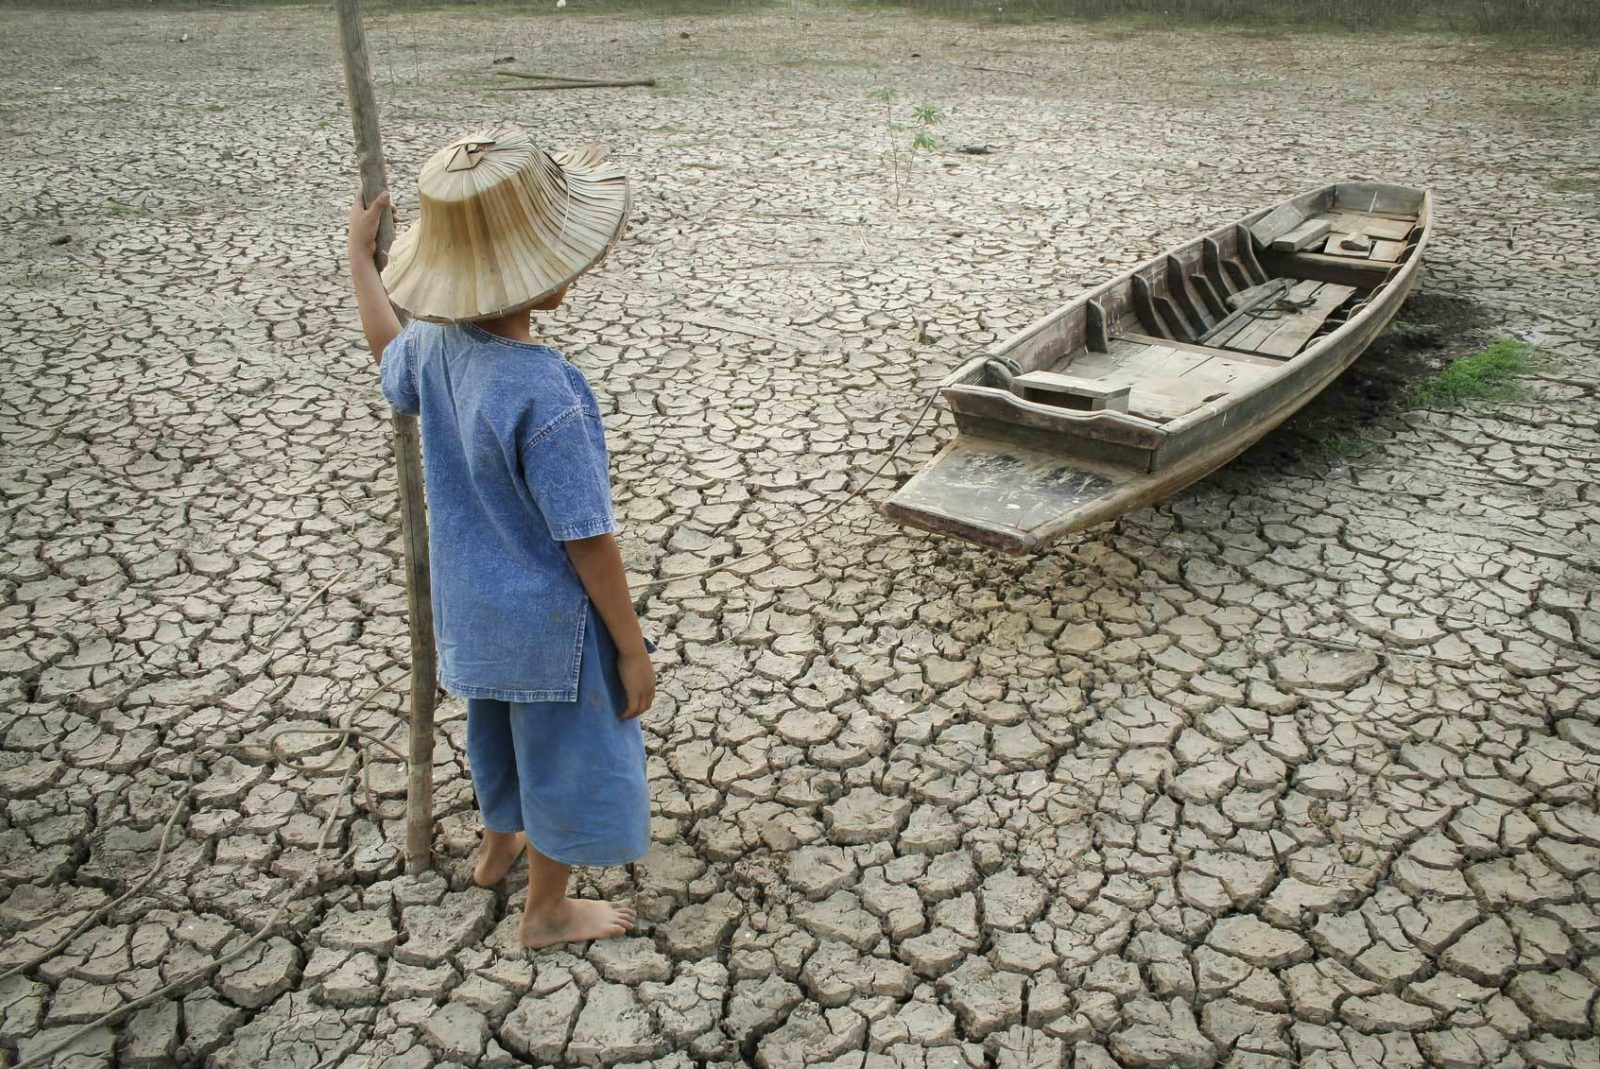 Una risorsa rinnovabile ma non inesauribile (4)